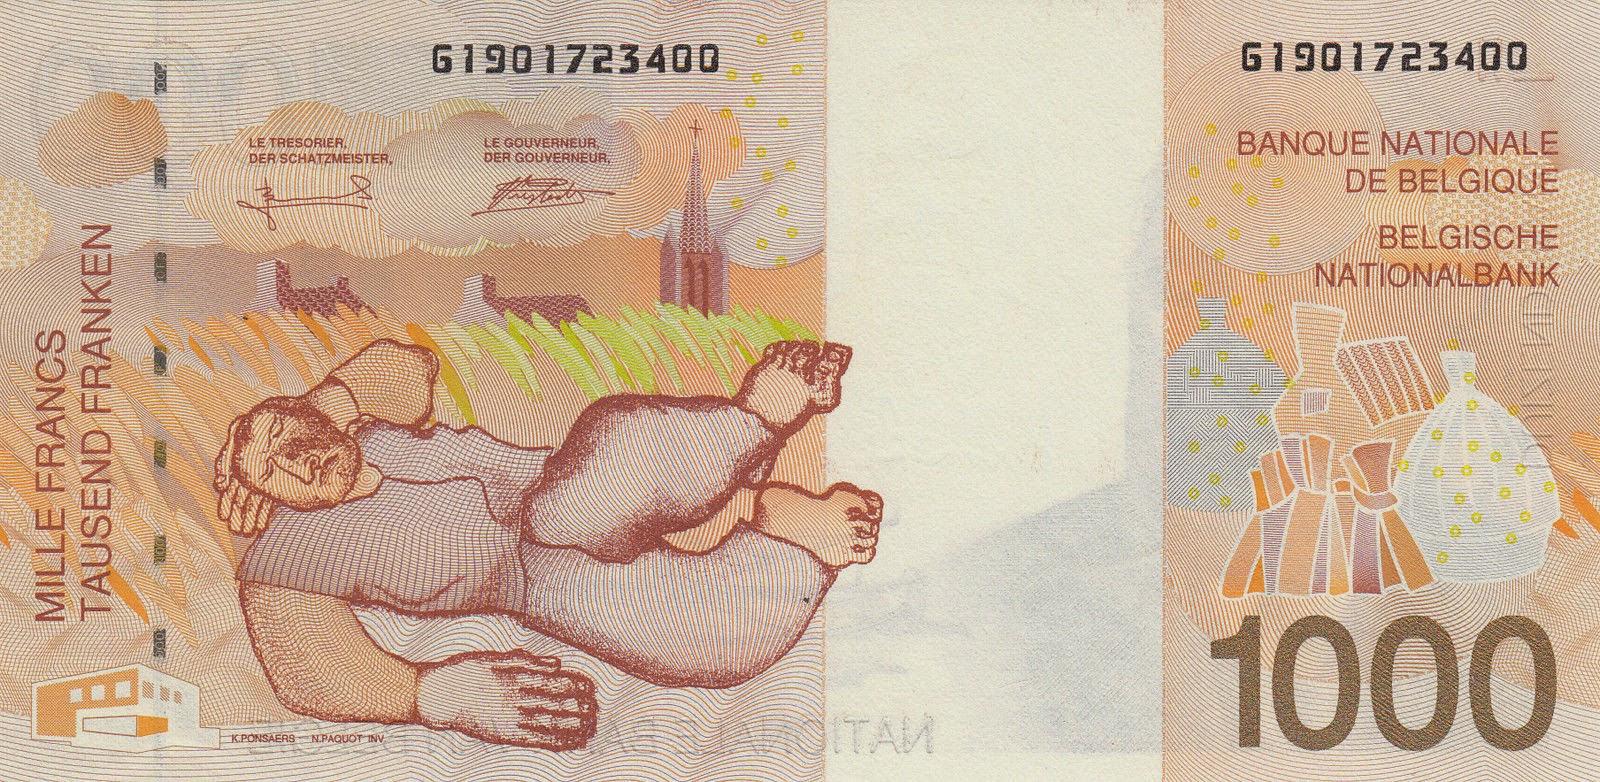 "Belgium Money Currency 1000 Belgian Francs banknote 1998 ""Lying farmer"" (Liggende Boer) by Constant Permeke"